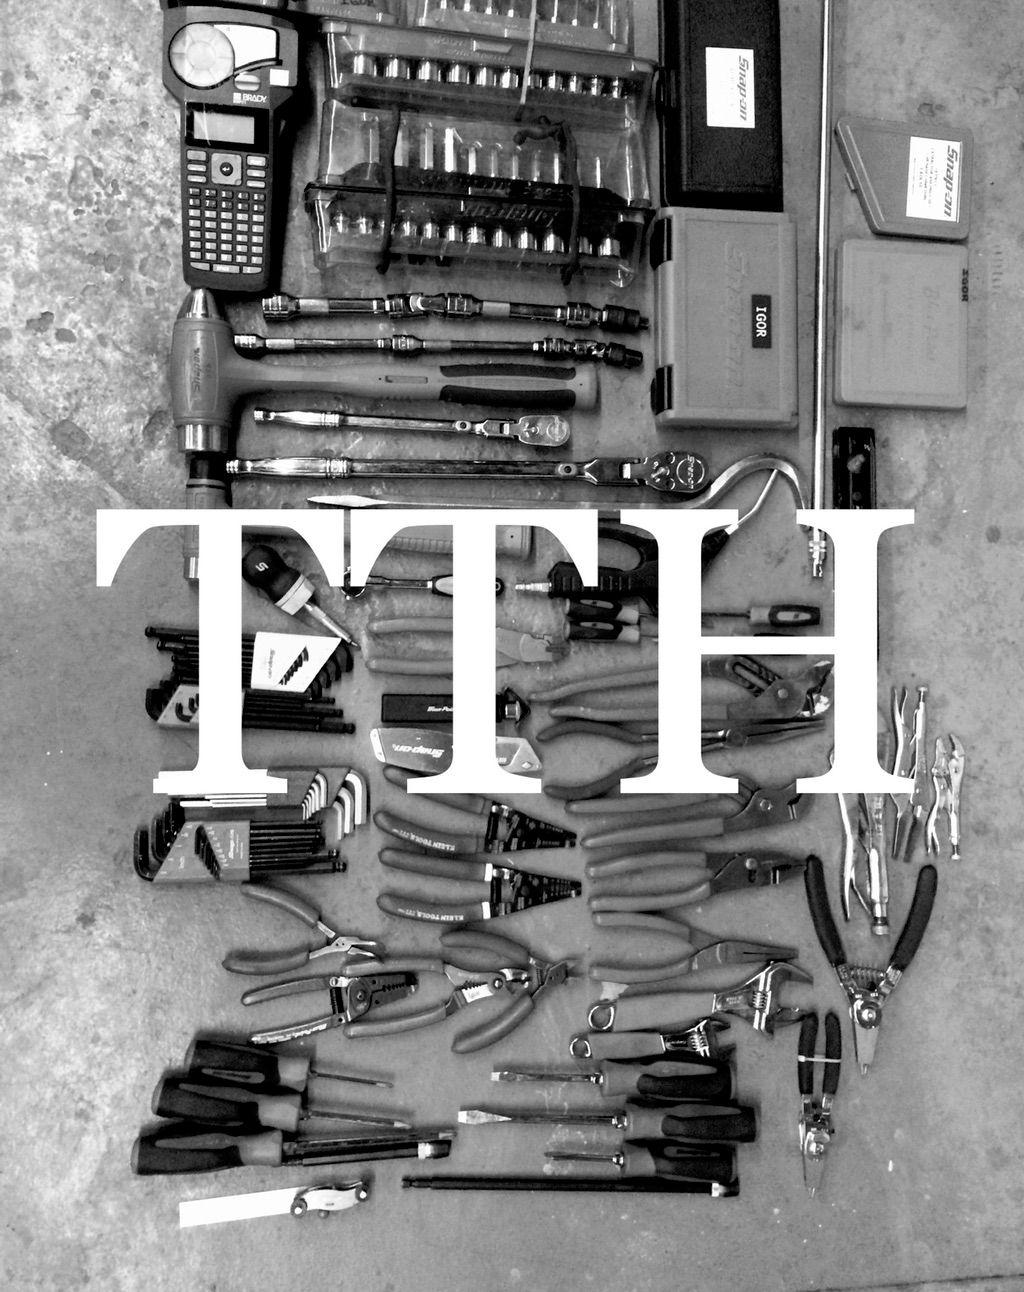 The Trusted Handyman